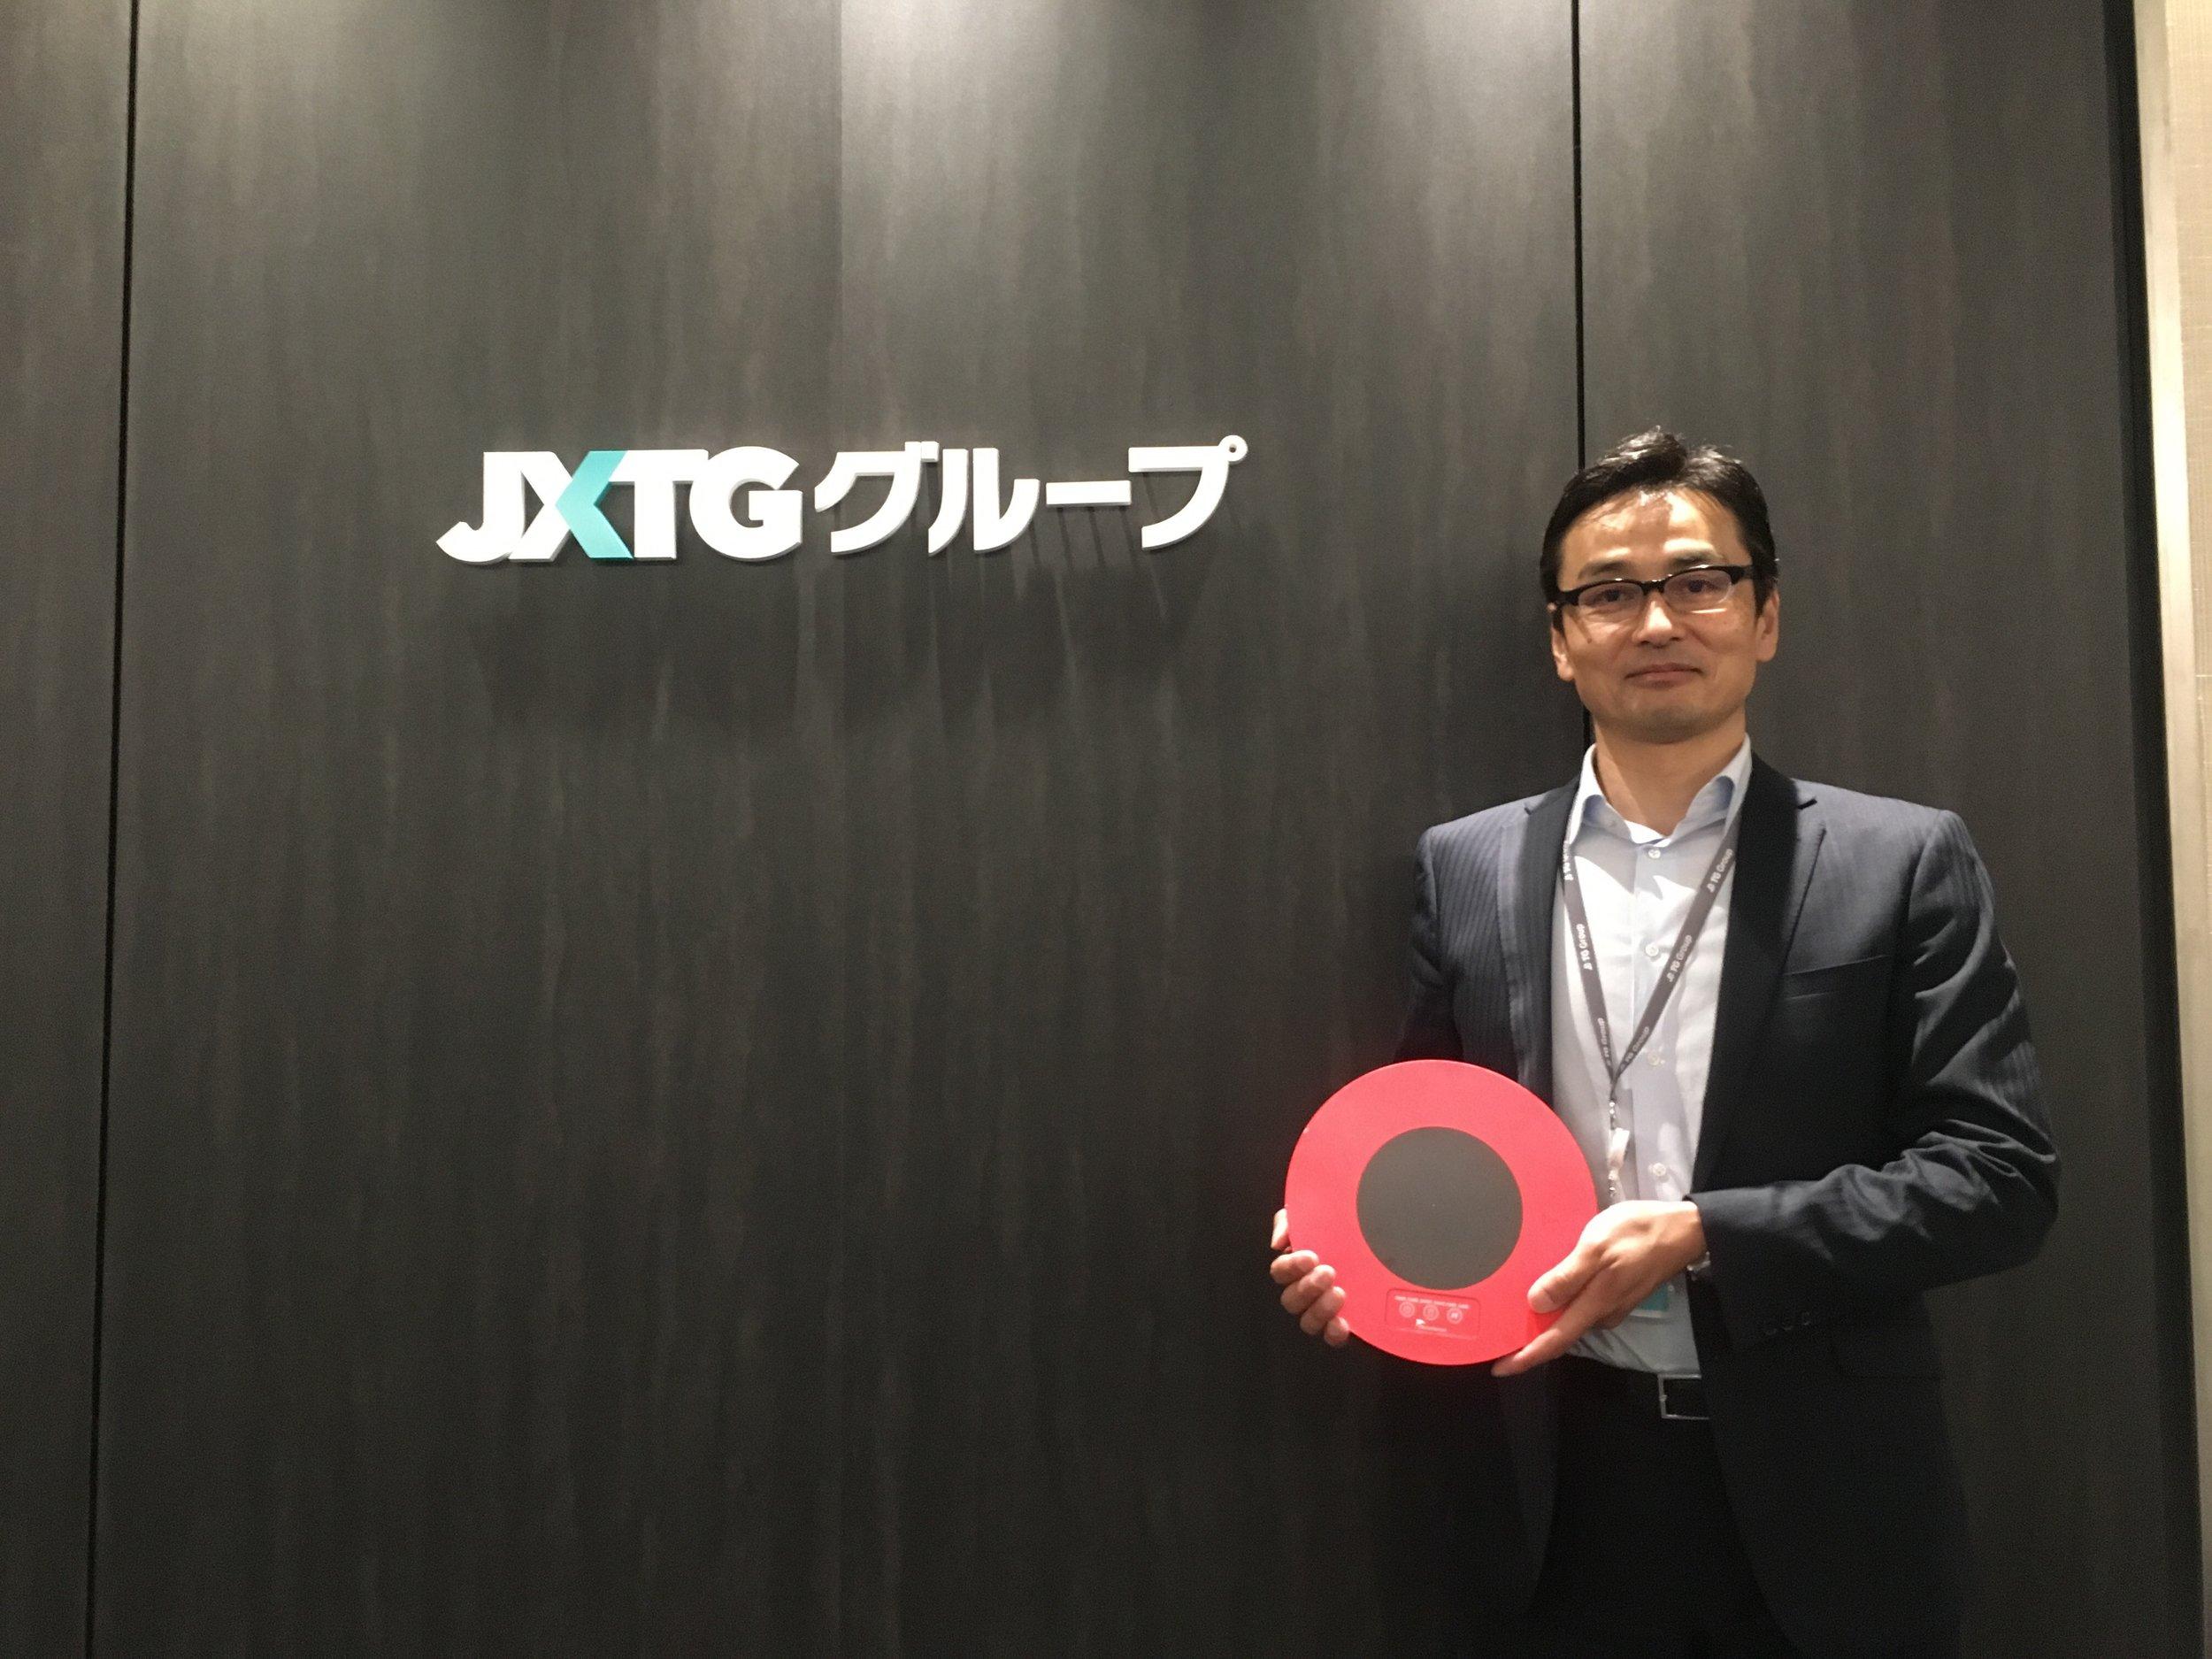 JX金属技術本部情報システム部主席技師山野井隆様